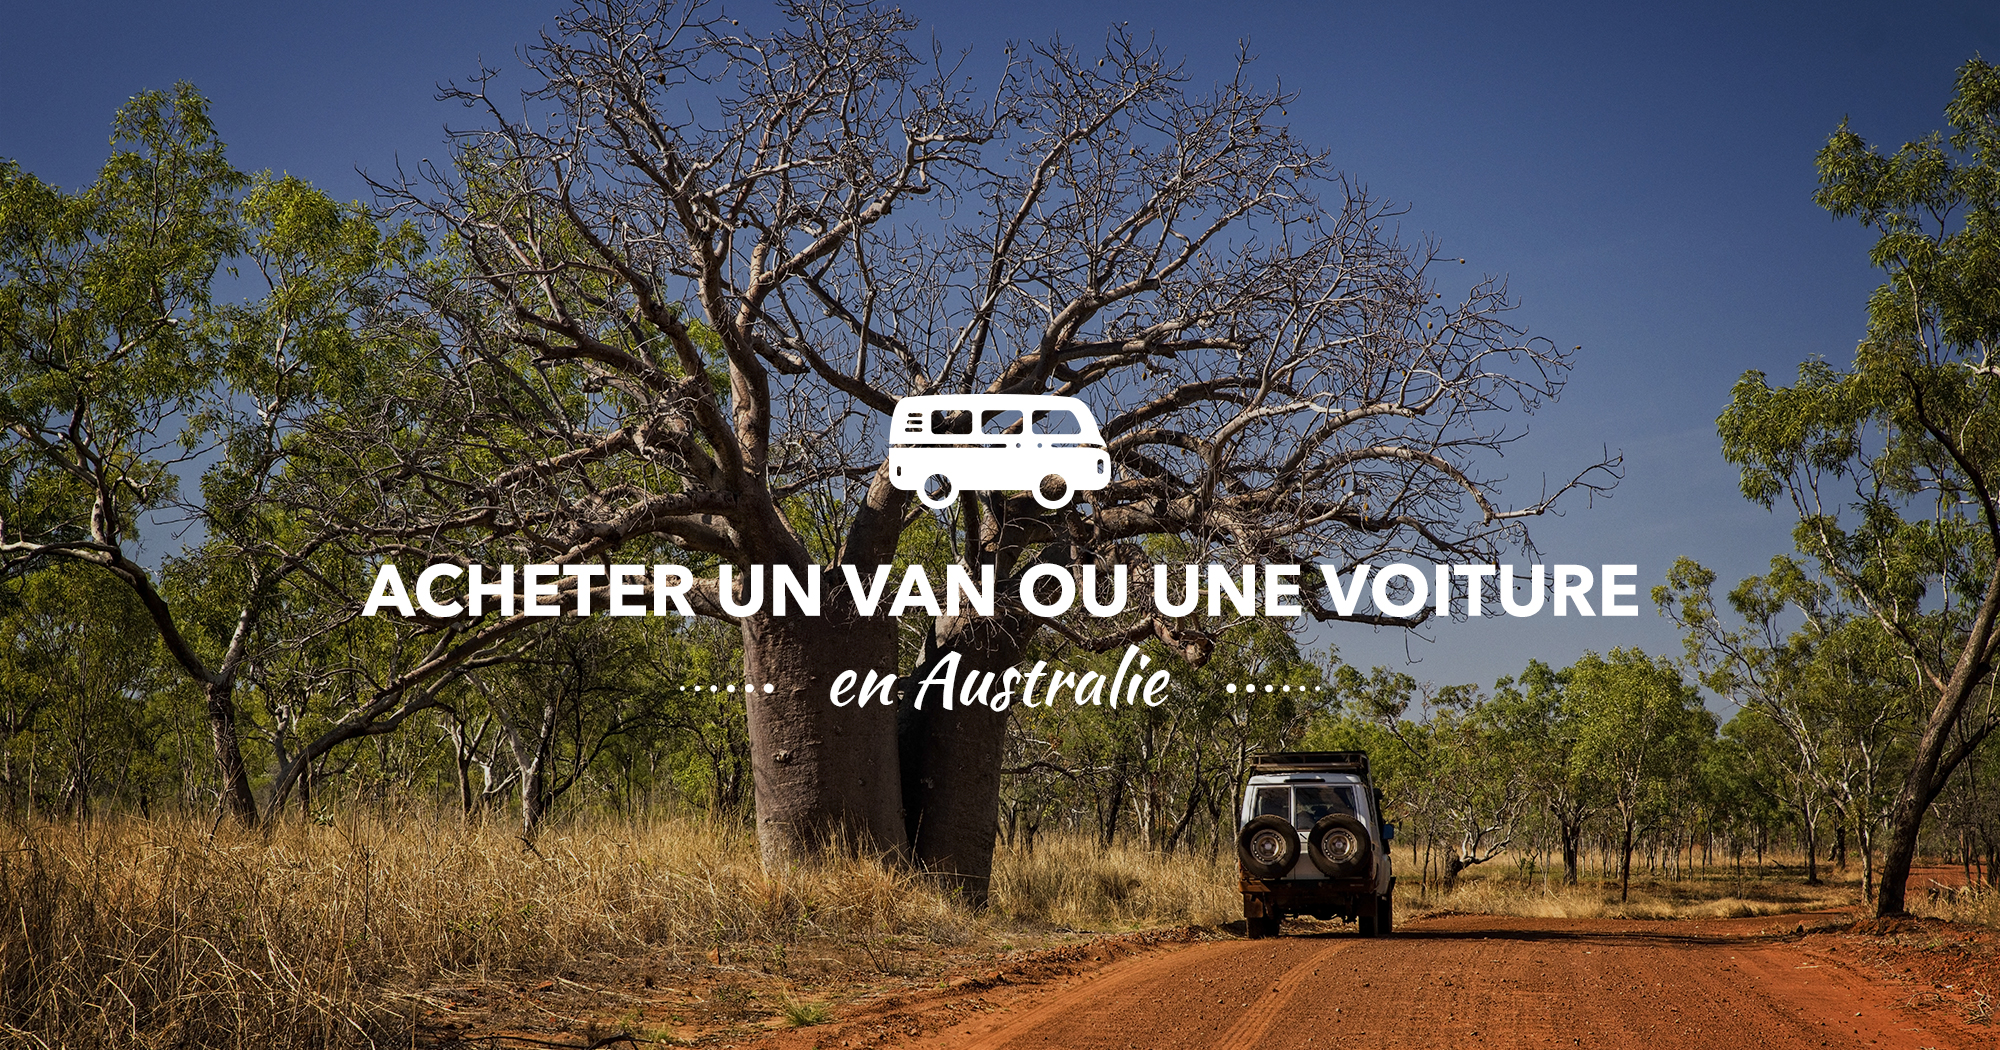 acheter un vehicule en belgique vente de voiture neuve en belgique acheter voiture moins cher. Black Bedroom Furniture Sets. Home Design Ideas